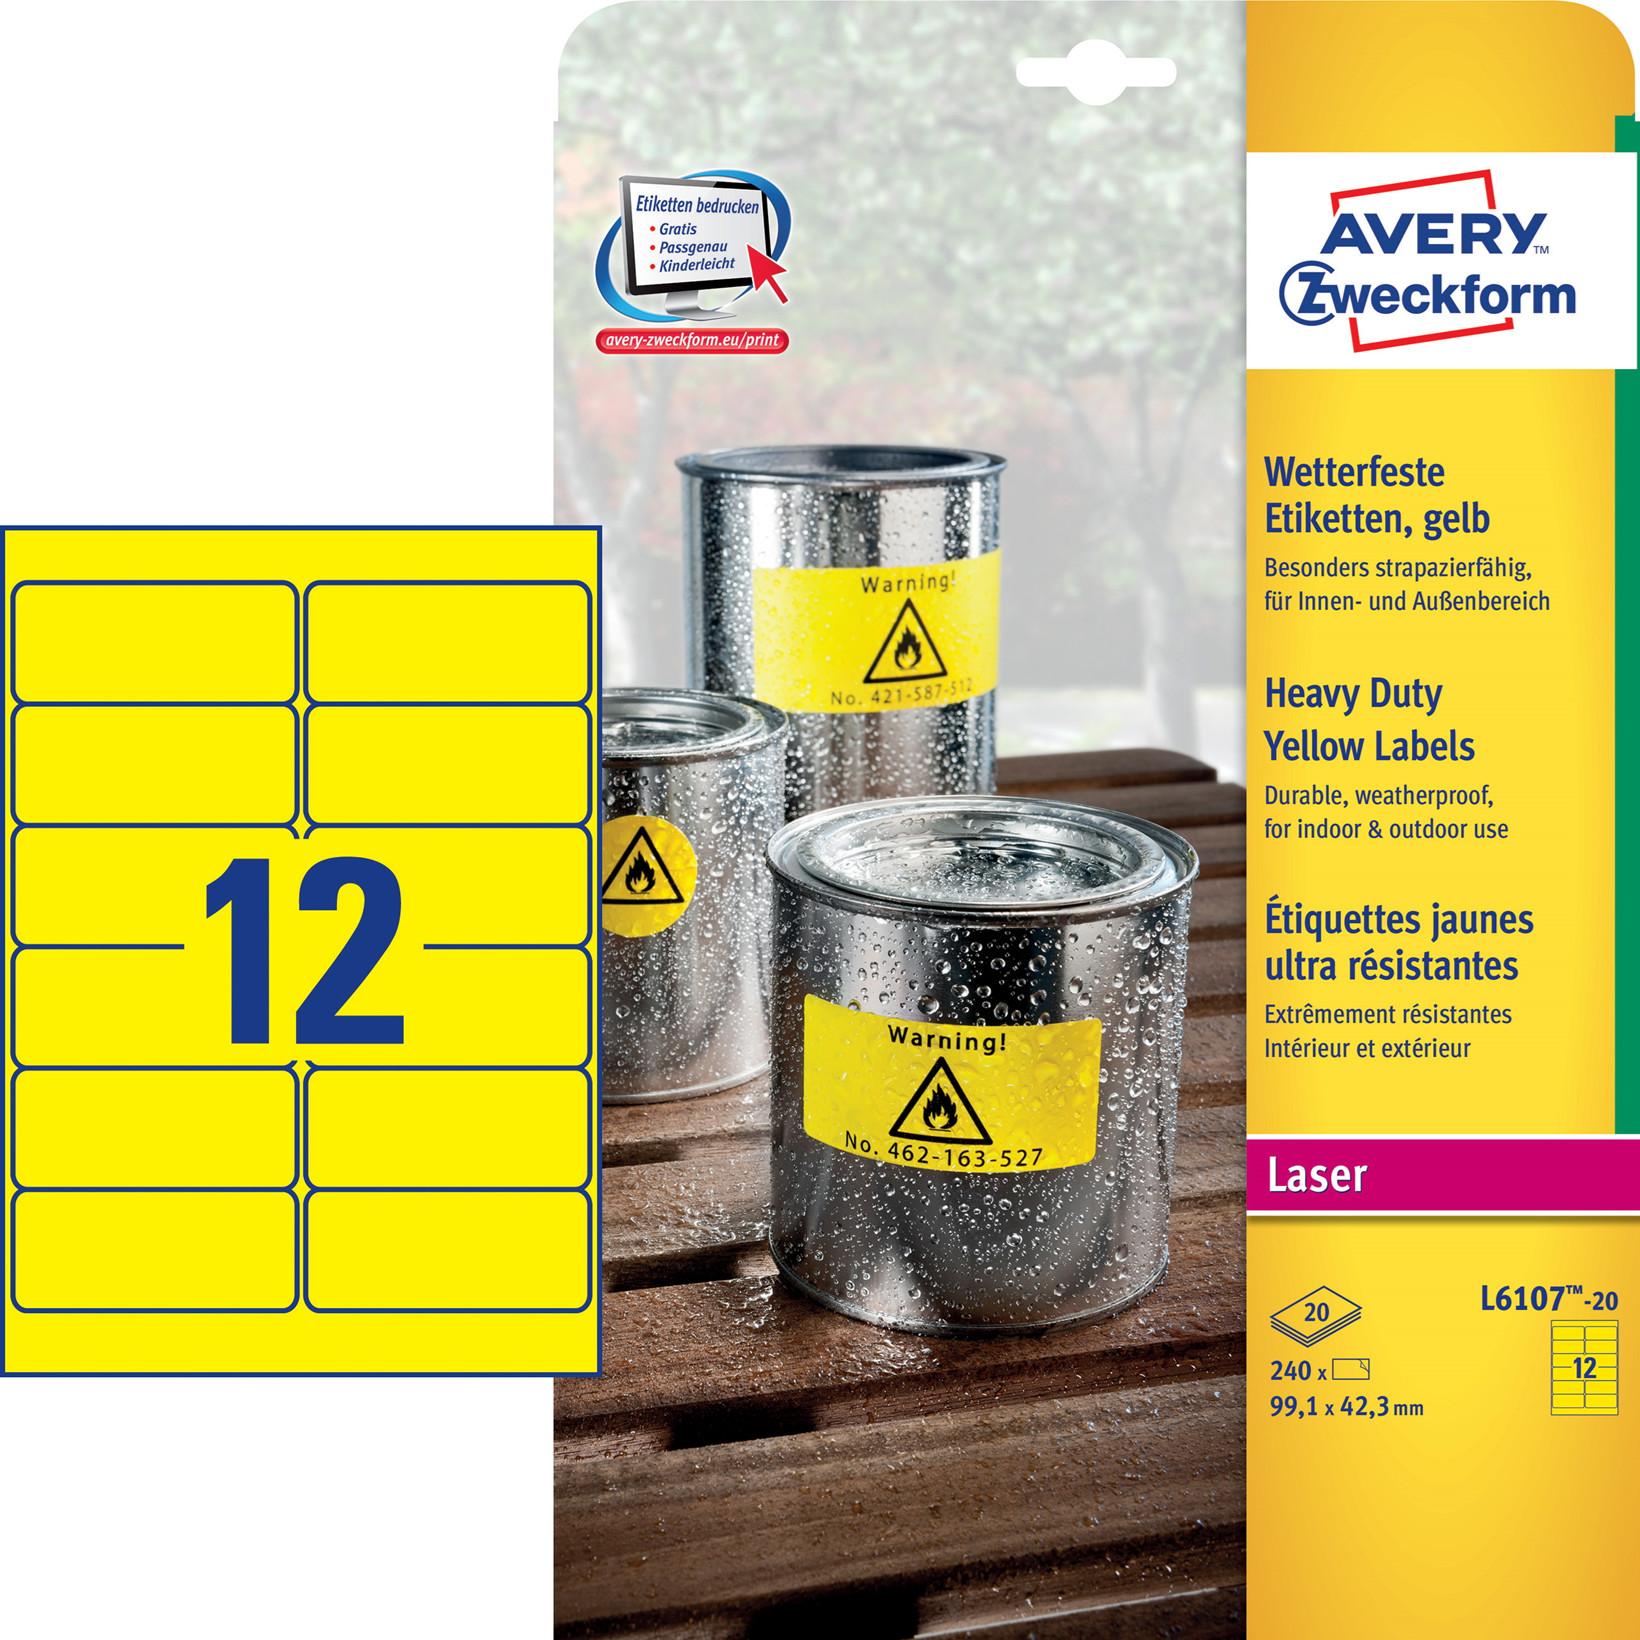 Avery L6107-20 - Laserlabel stærk gul 12 pr. ark 99,1 x 42,3 mm - 20 ark